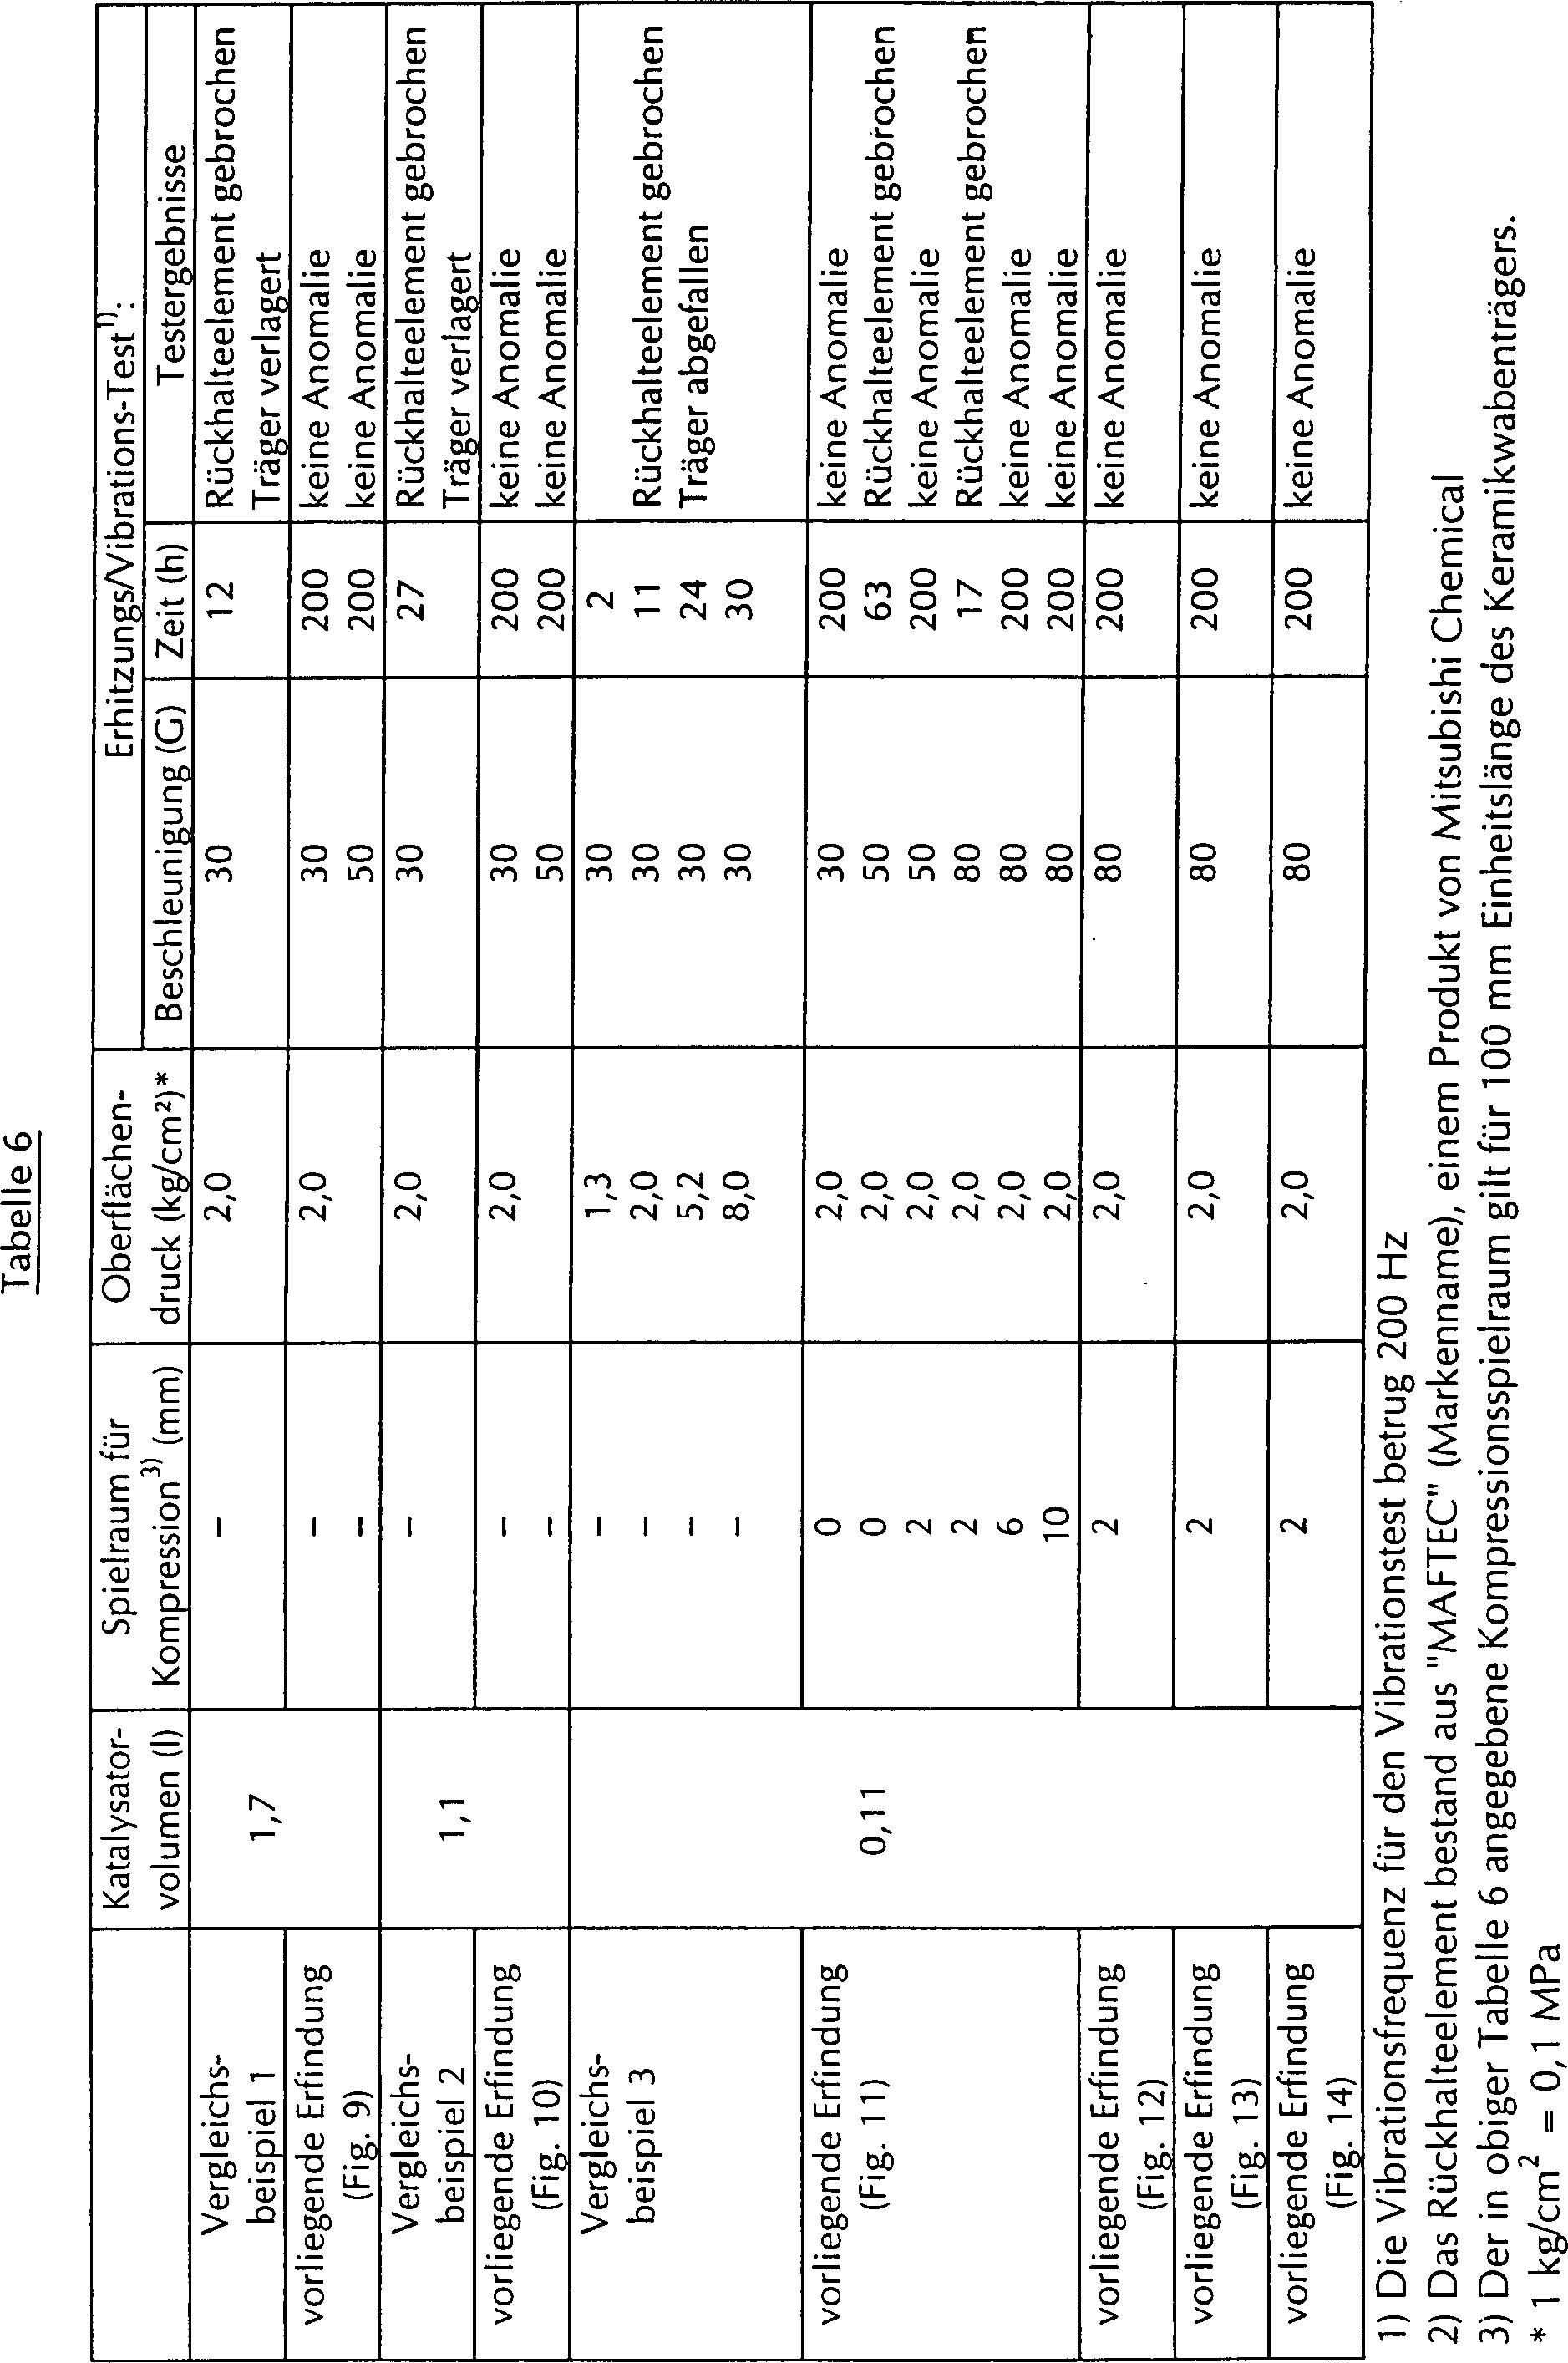 DE69414792T3 - Ceramic honeycomb catalyst device - Google Patents